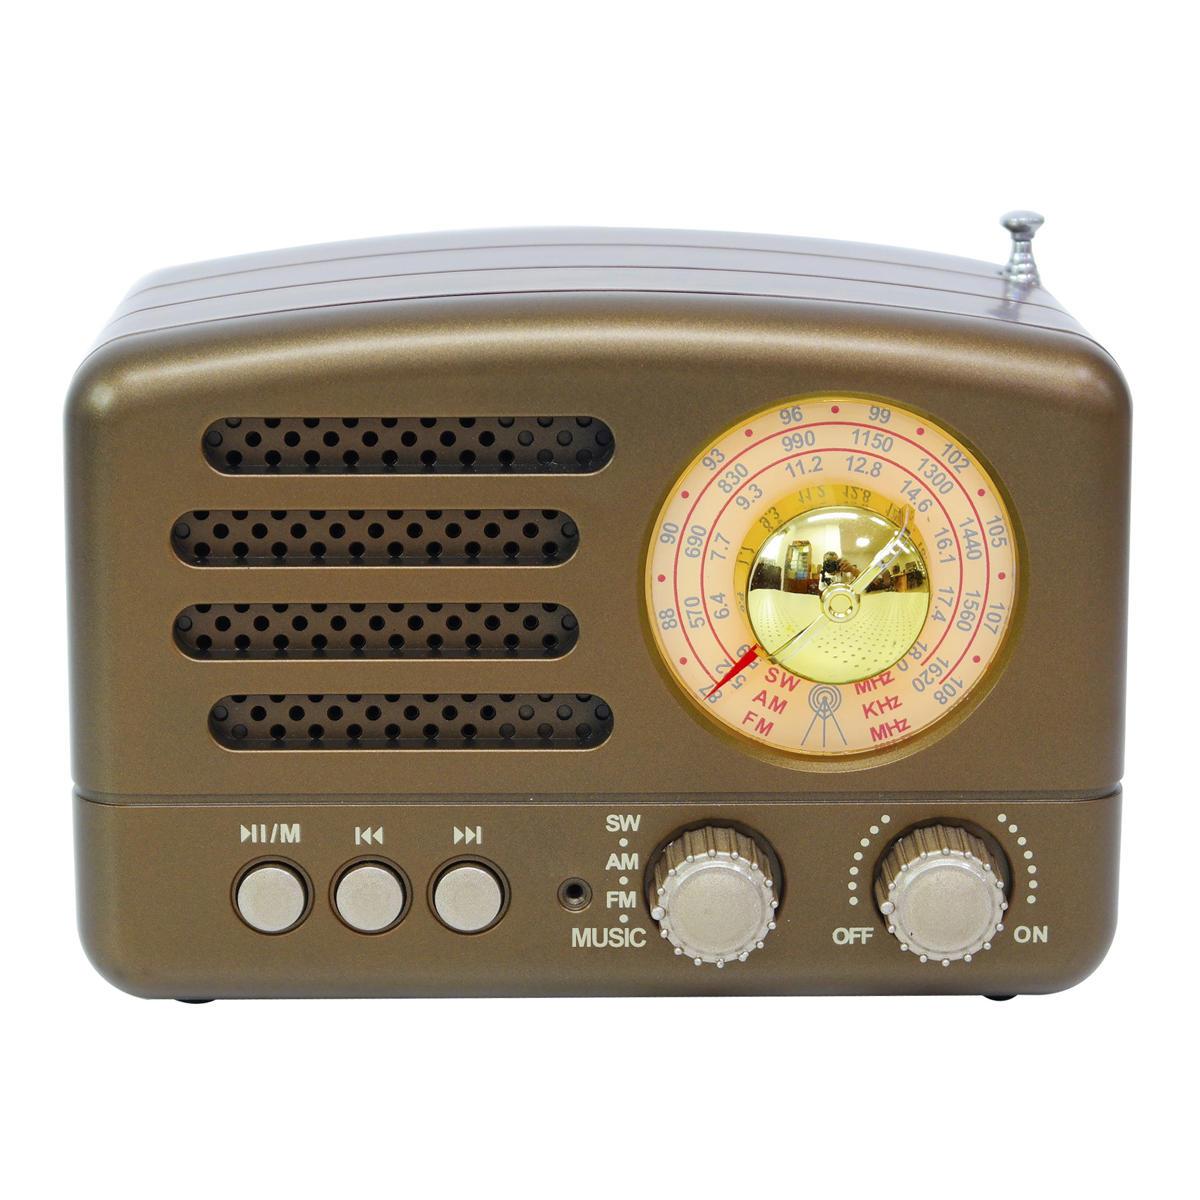 Taşınabilir AM FM AUX Vintage Retro Radyo SW Bluetooth Hoparlör TF Kart USB MP3 Müzik Çalar